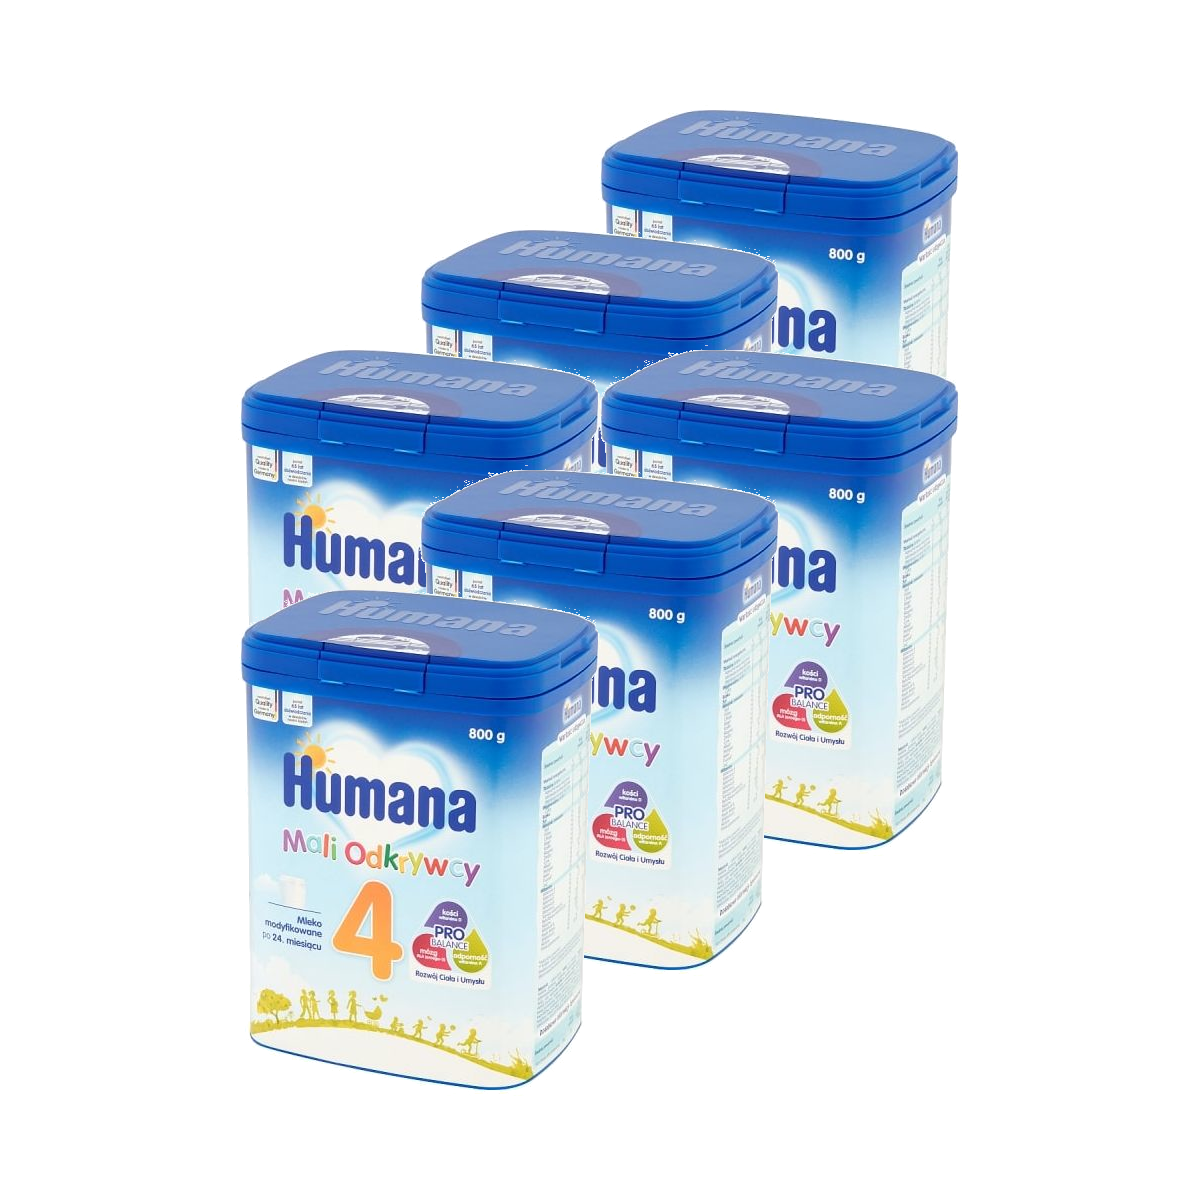 humana4_800_6pak